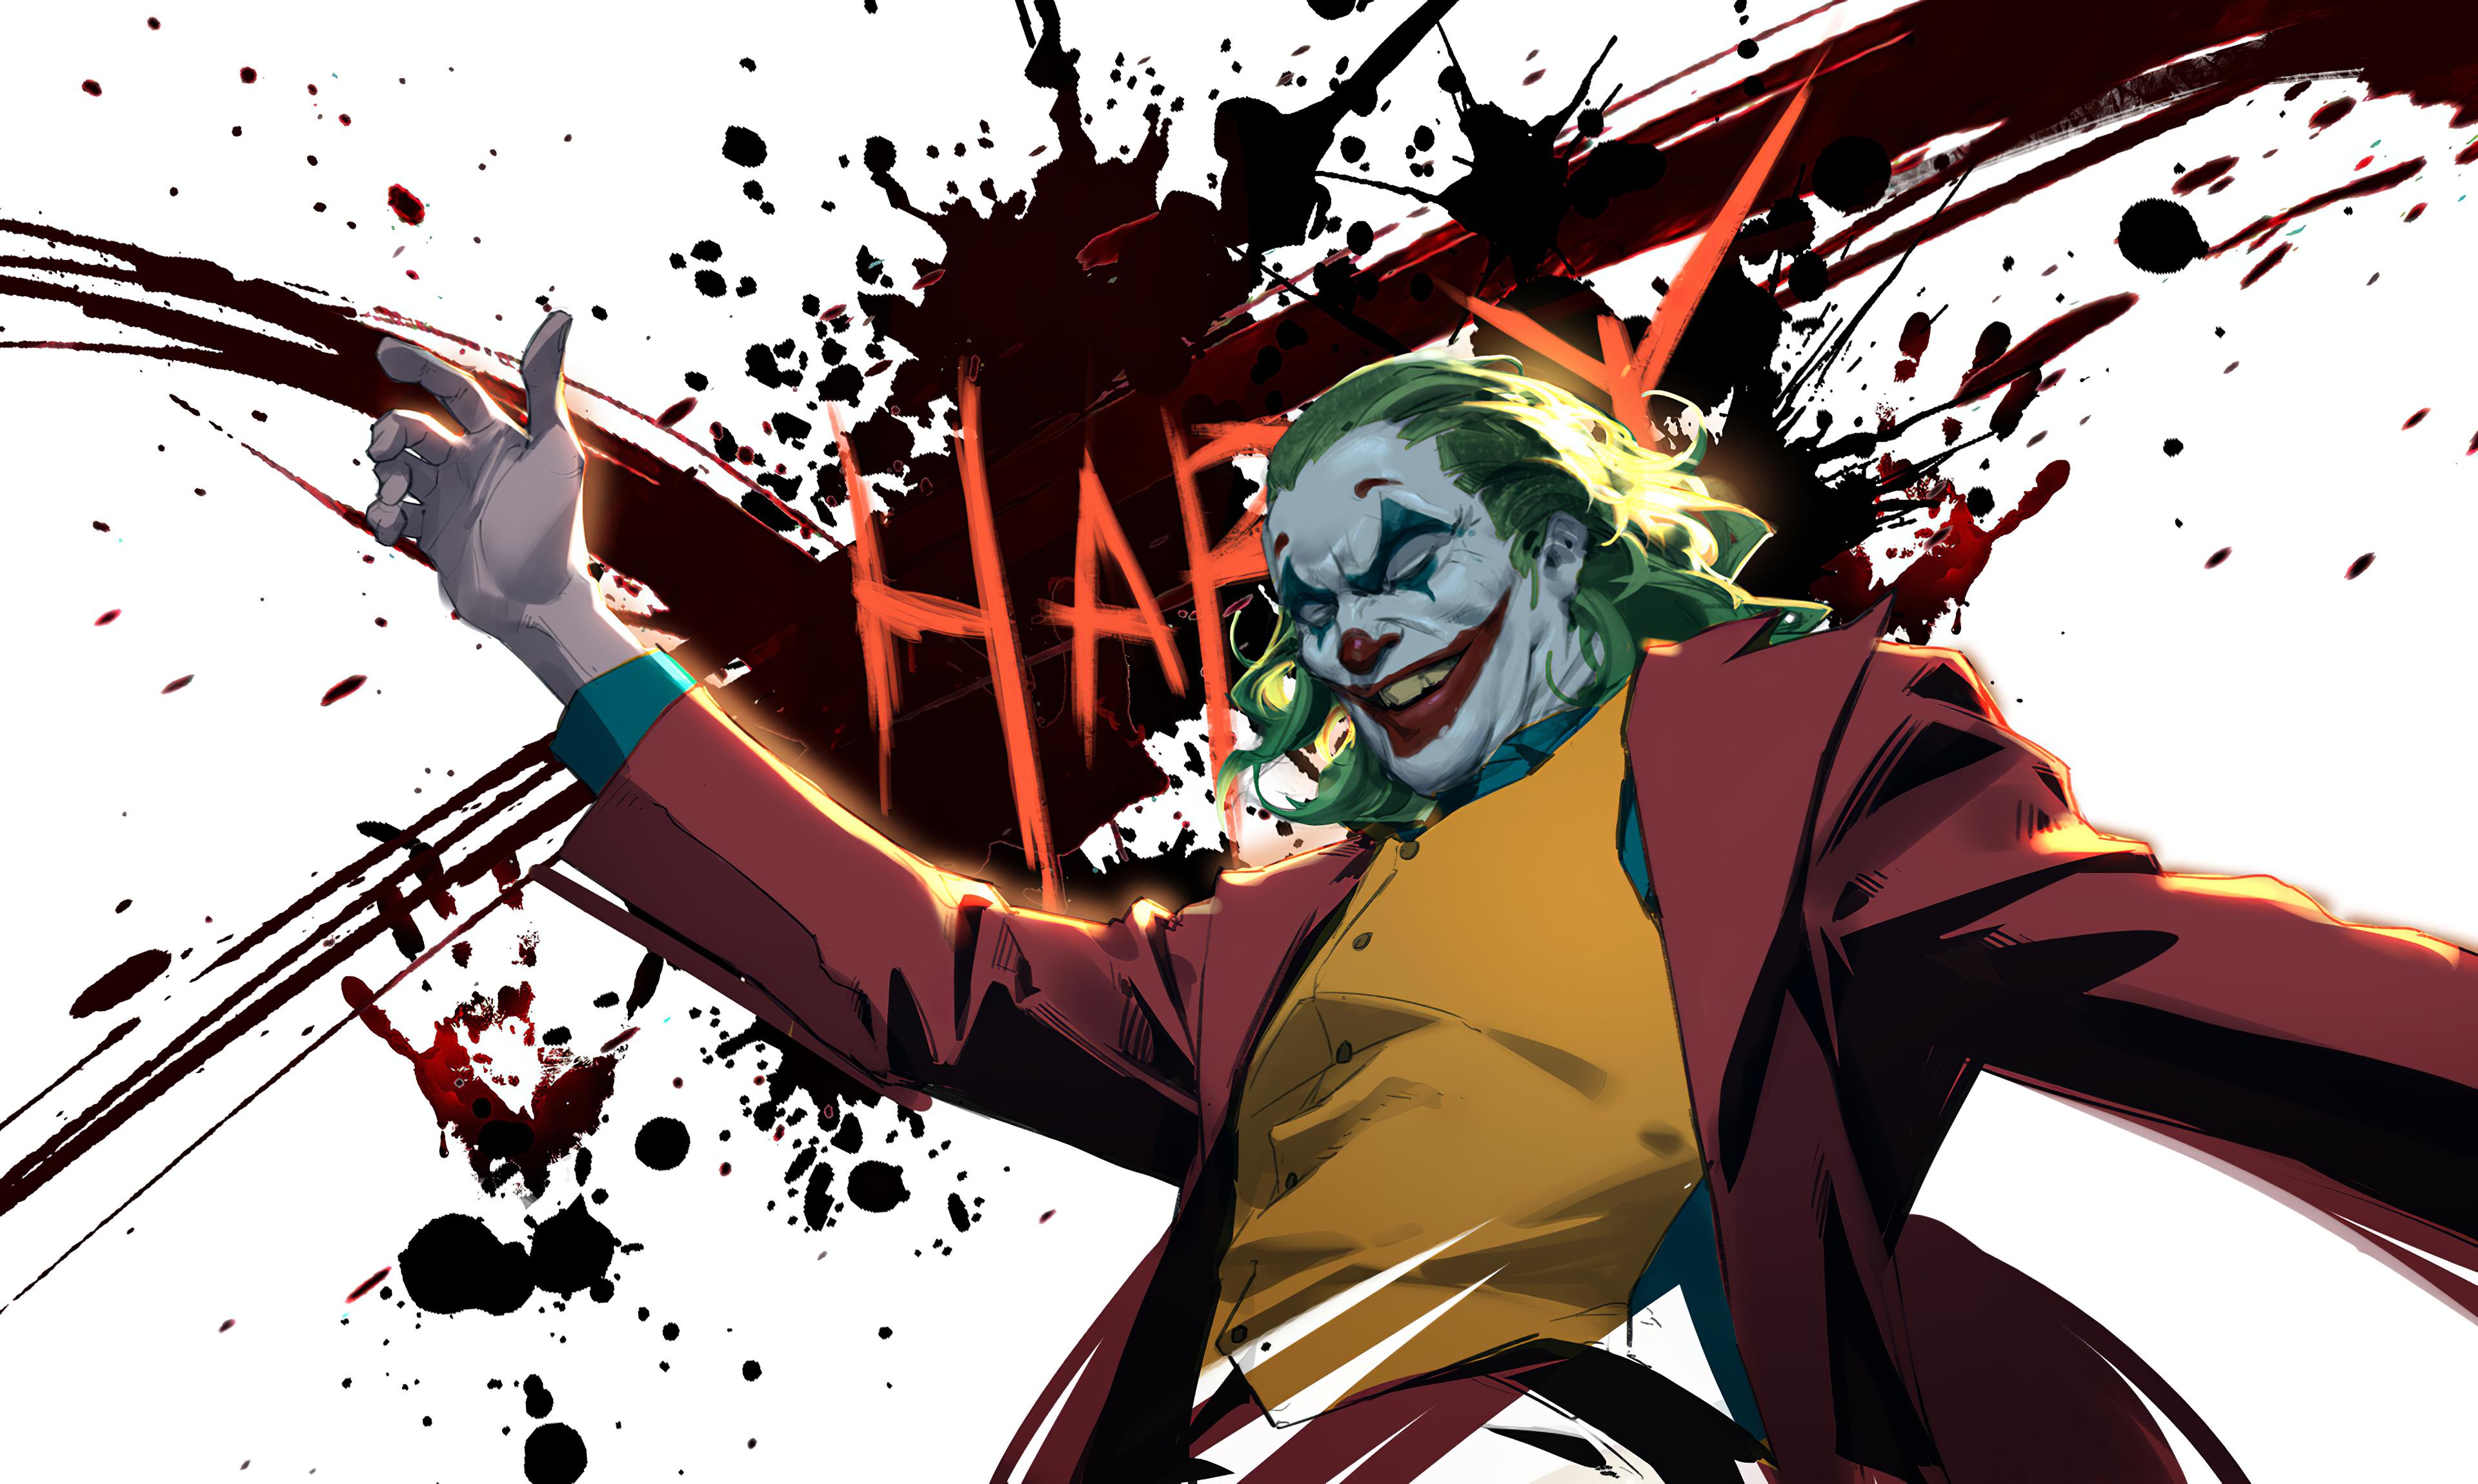 joker winner art 1576093344 - Joker Winner Art - Joker wallpaper 4k hd, joker phone wallpaper hd 4k, joker hd wallpaper 4k, joker art wallpaper hd 4k, 4k wallpaper joker